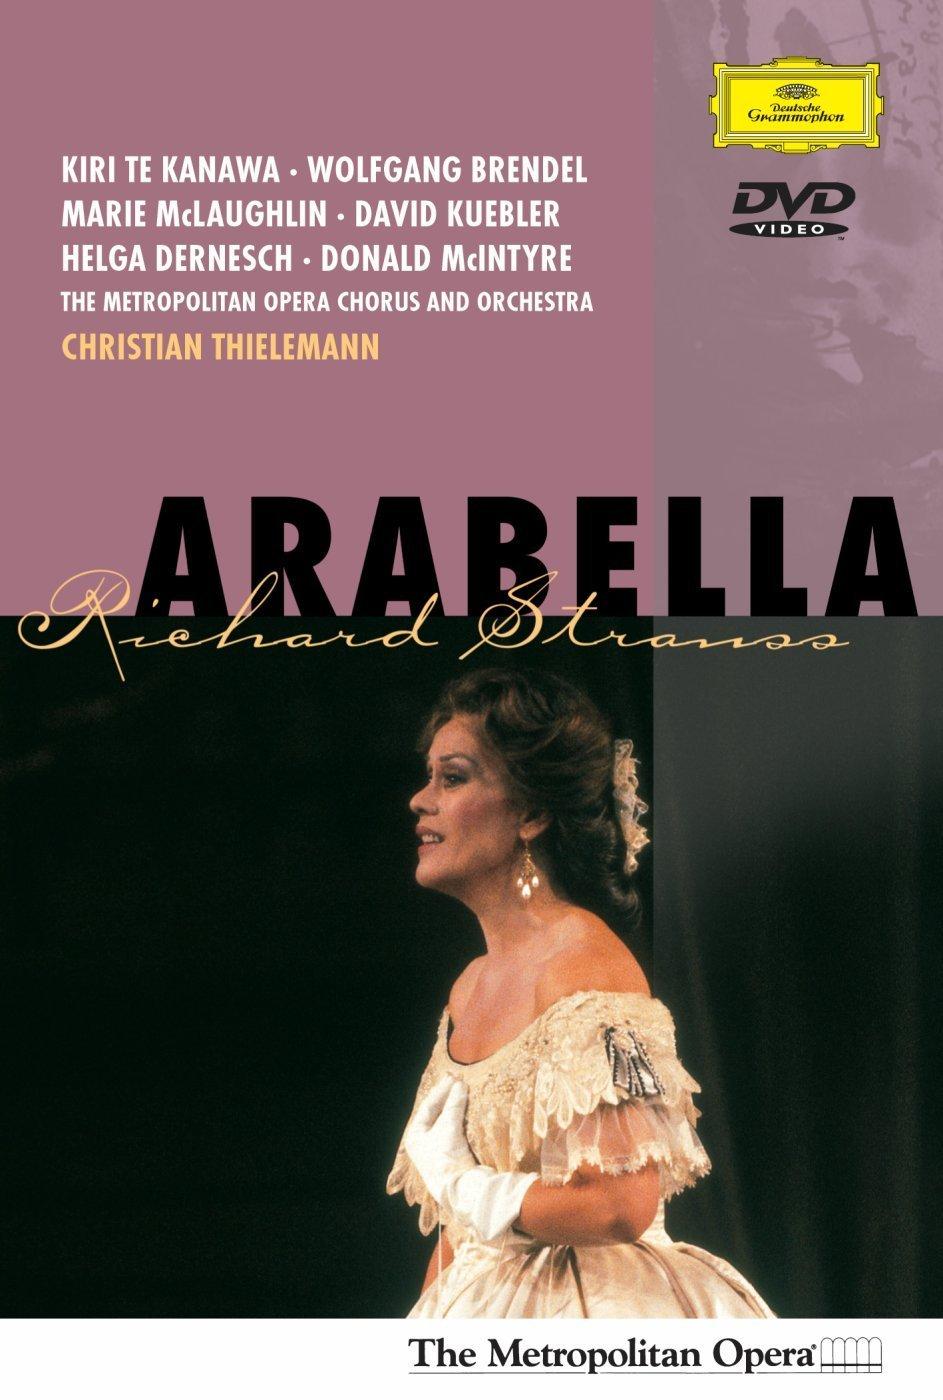 arabella-kanawa-schenk